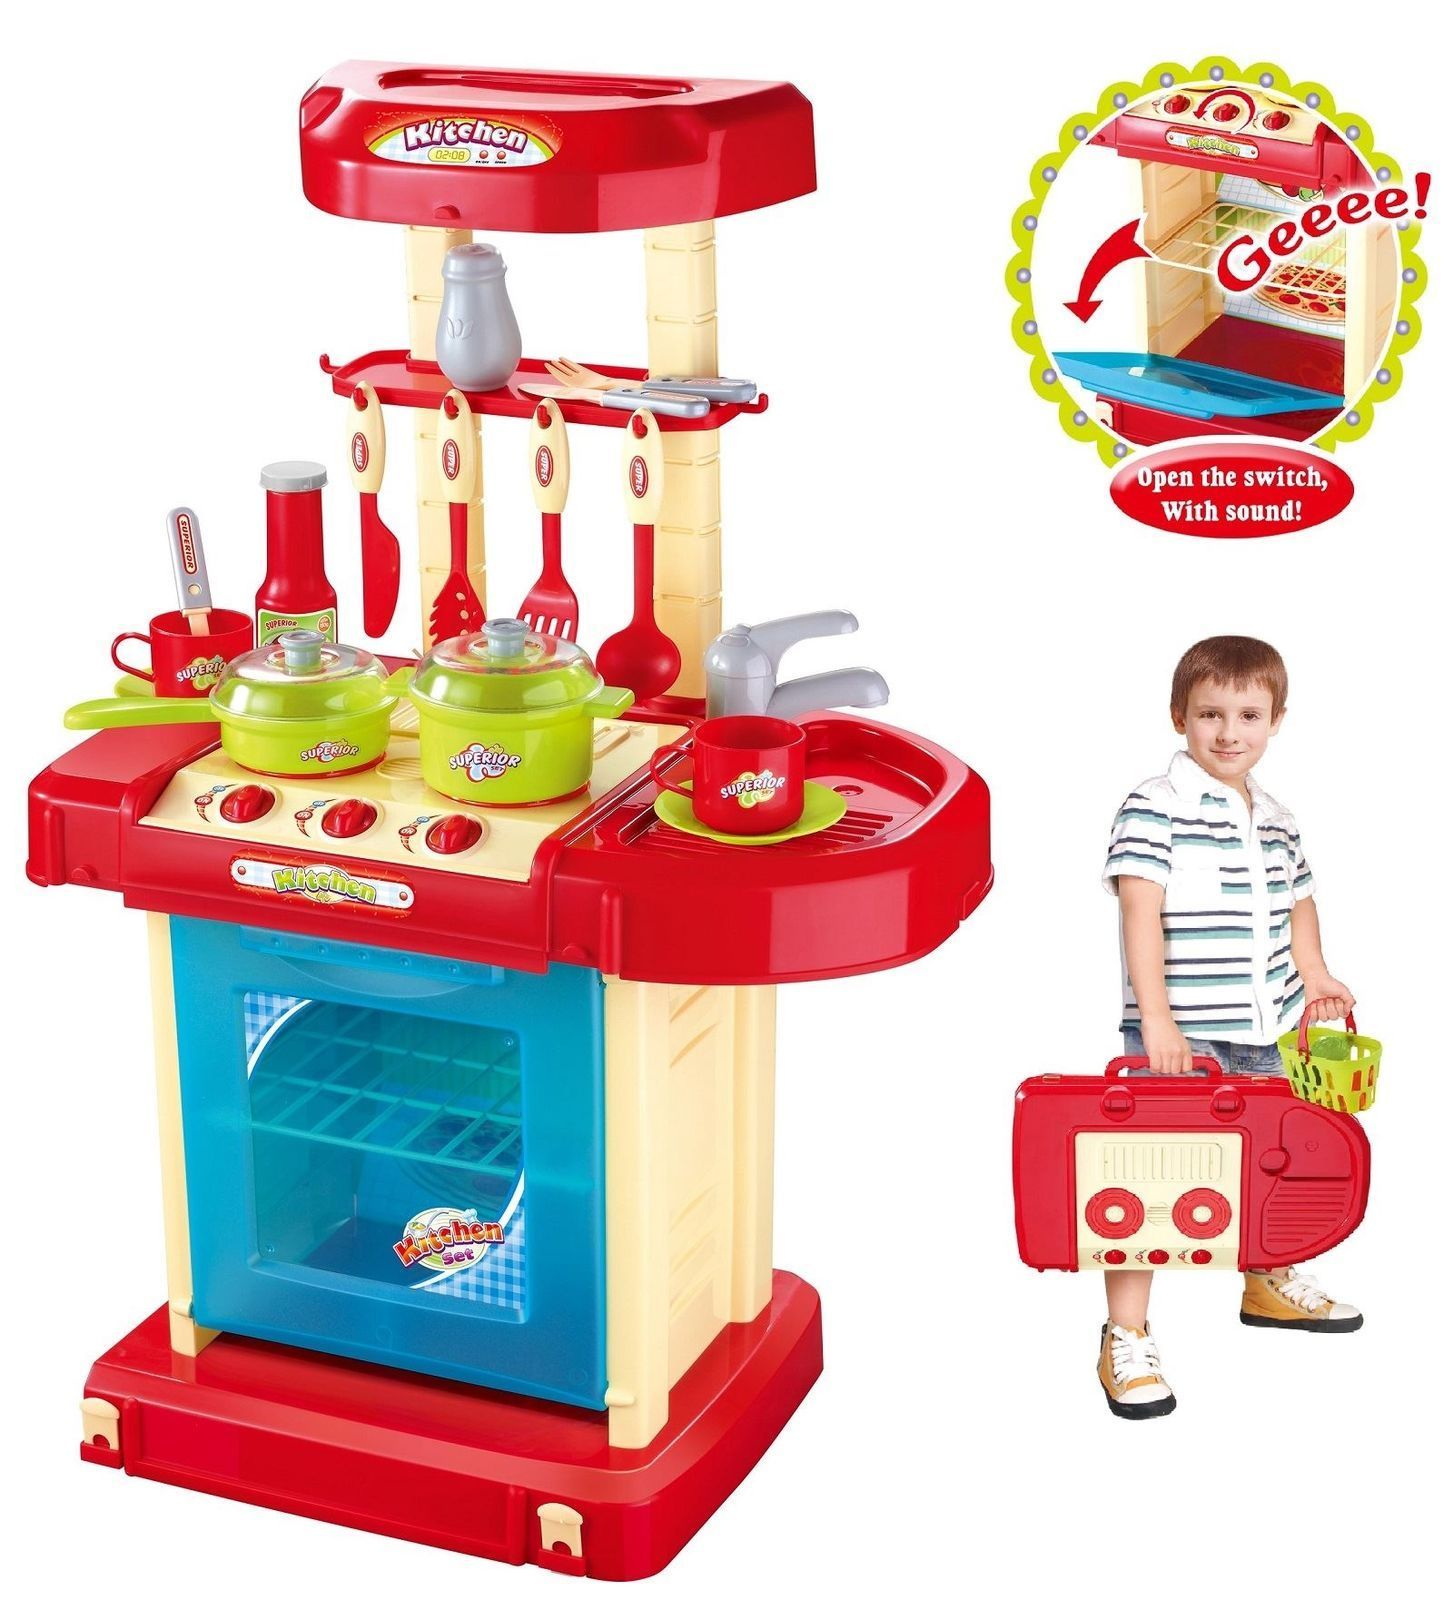 k che kinder kochen vorschule spielsachen koch spielset f r jungen m dchen ebay. Black Bedroom Furniture Sets. Home Design Ideas